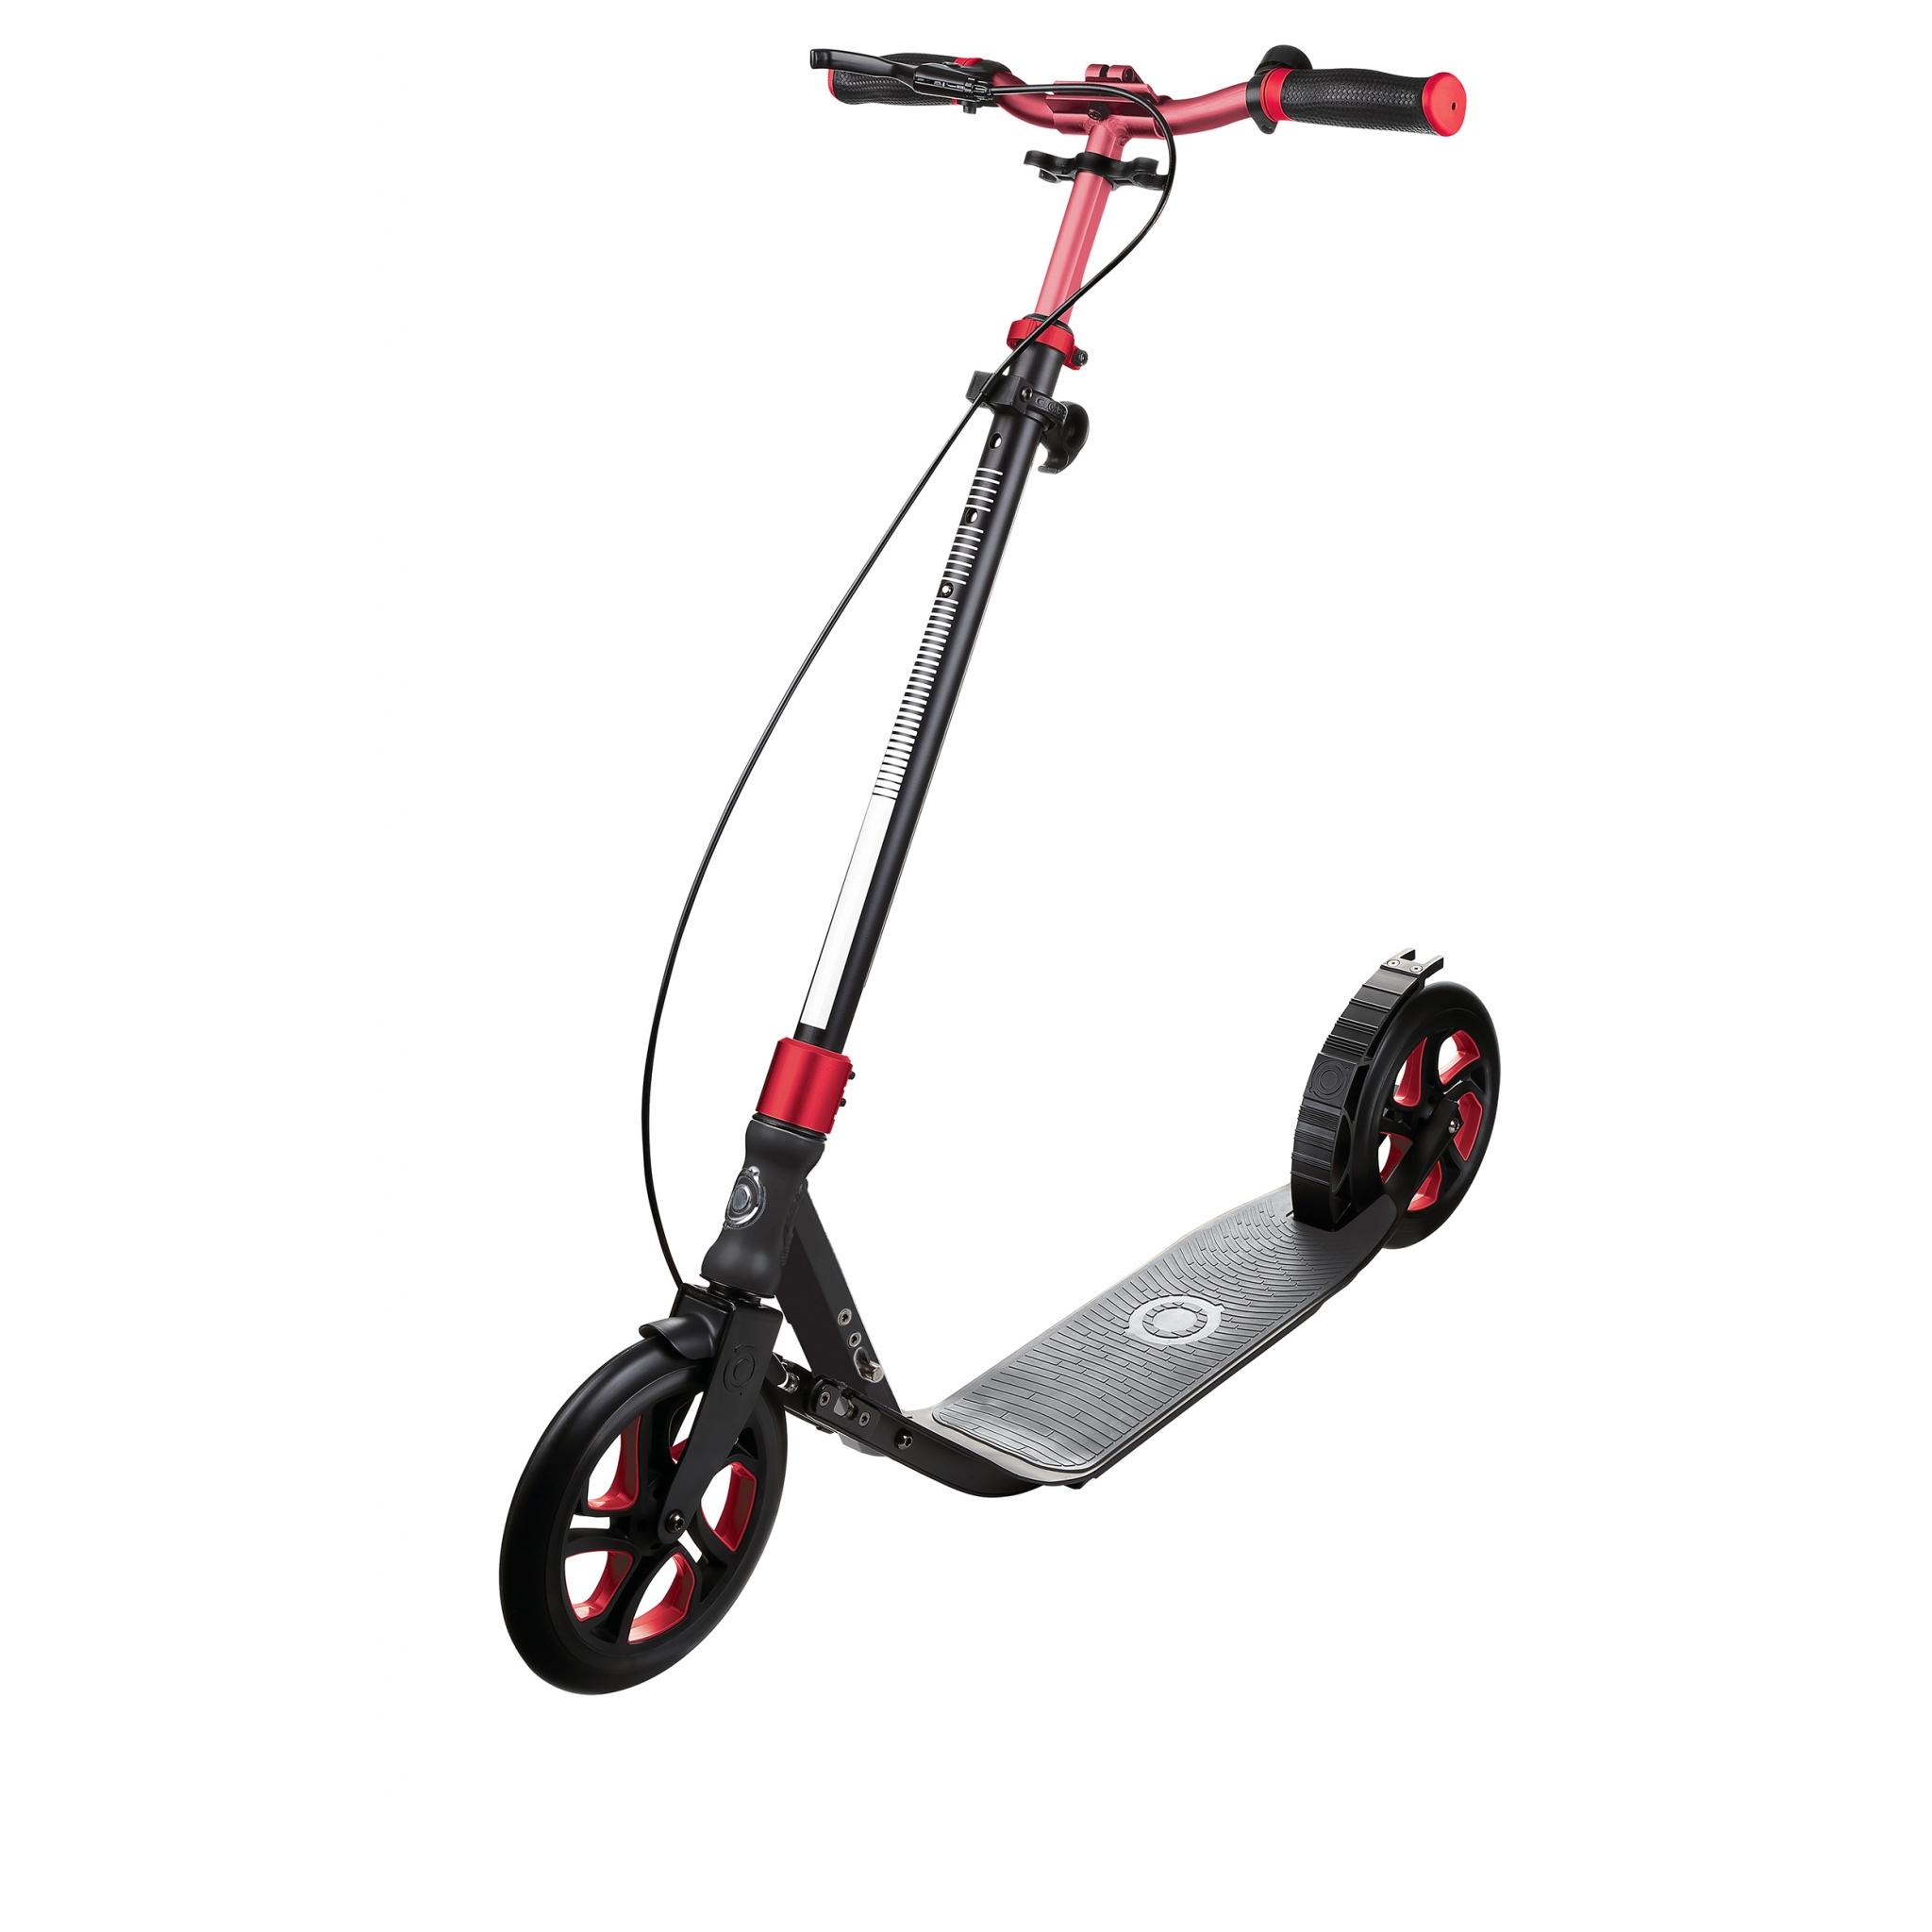 big wheel kick scooter - Globber ONE NL 230 ULTIMATE 1